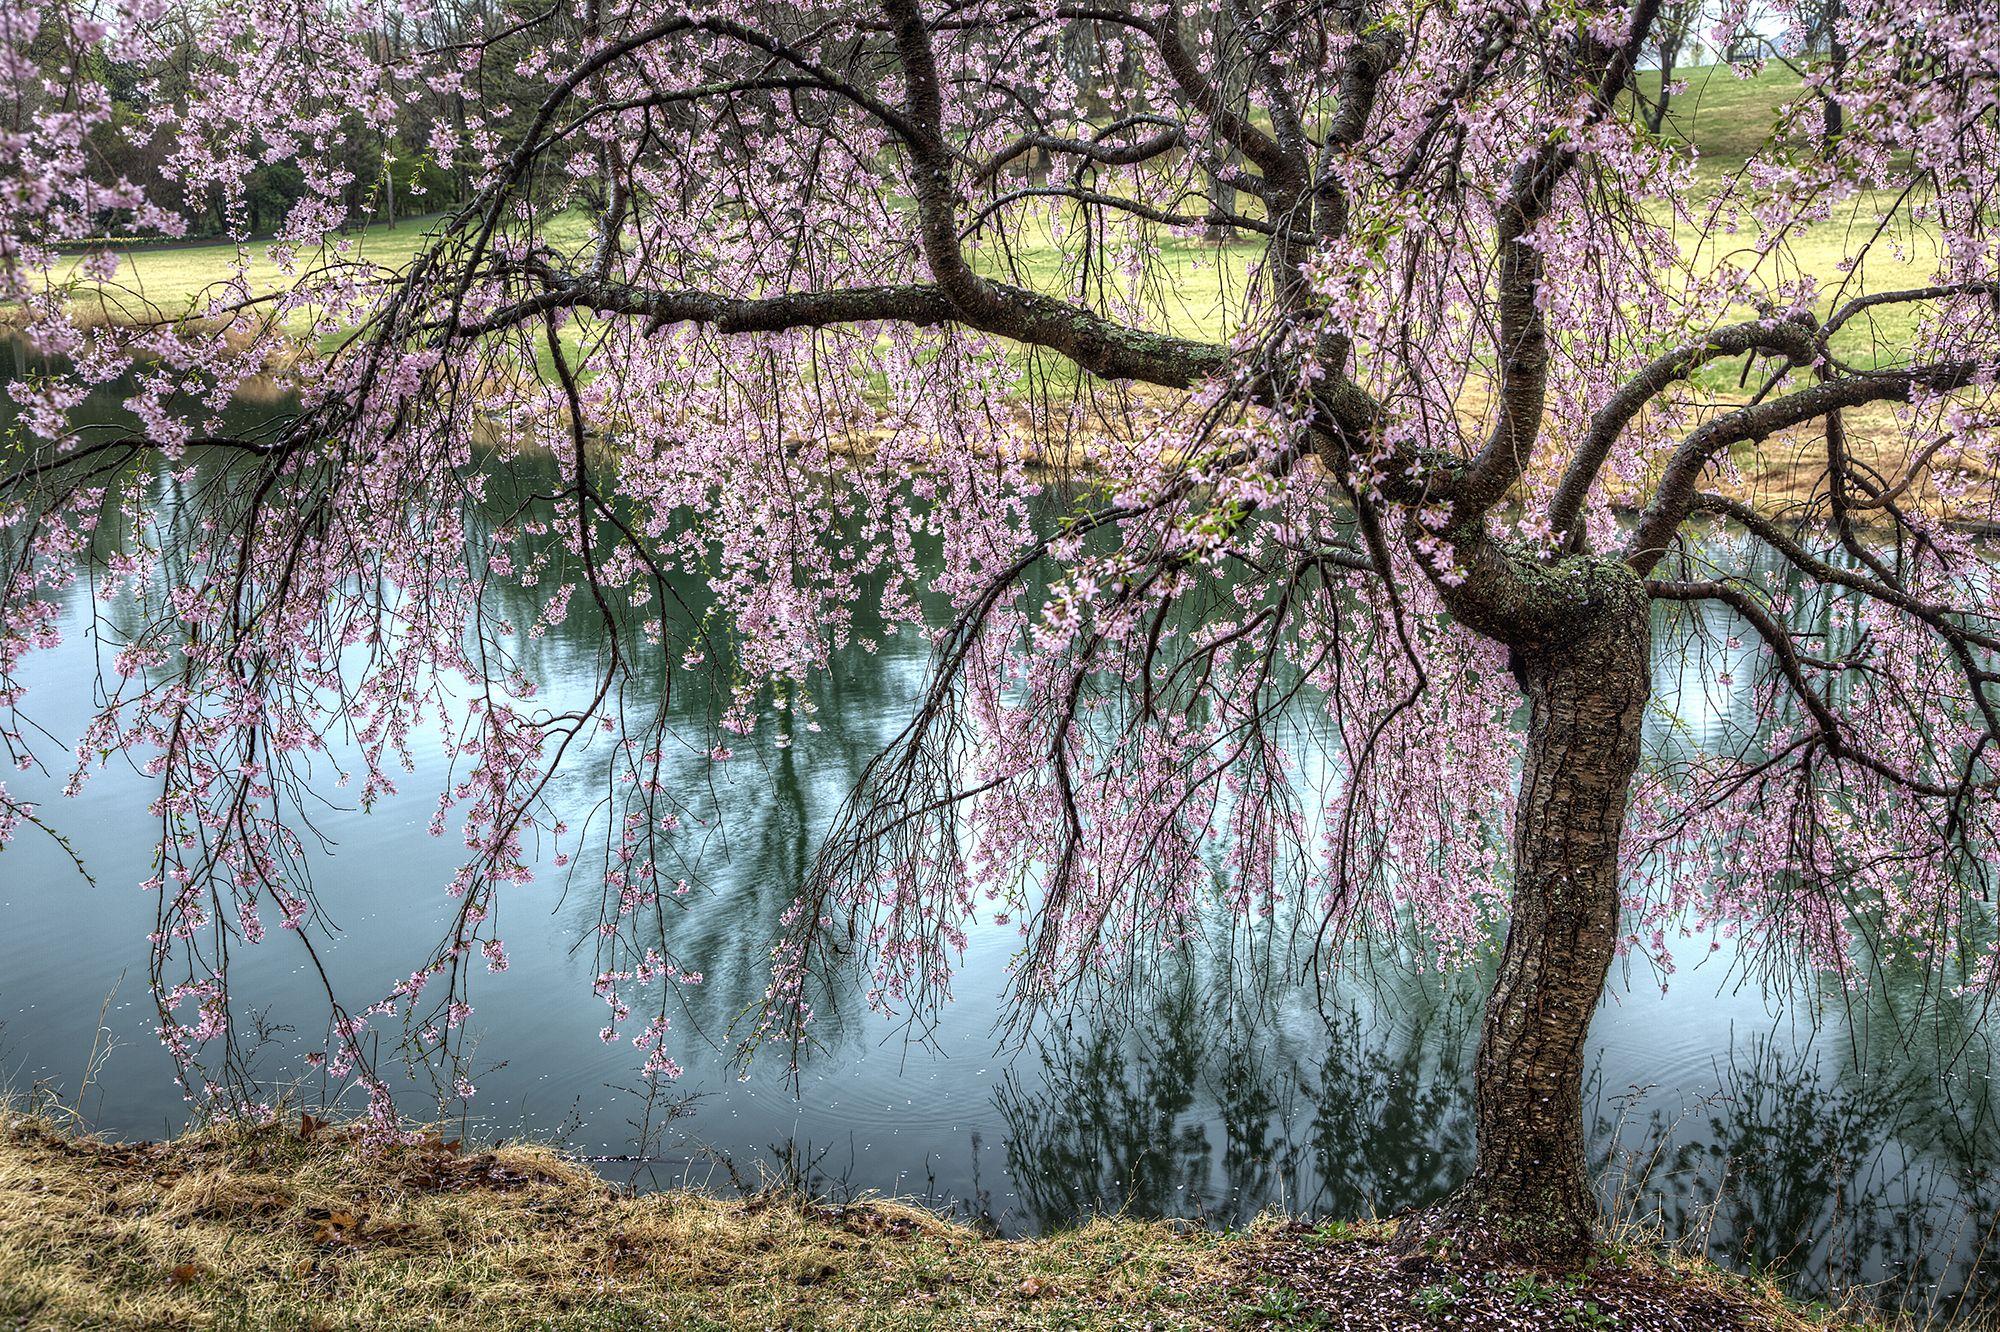 Weeping Cherry Blossom Tree Jpg 2000 1332 Cherry Blossom Tree Weeping Cherry Tree Blossom Trees